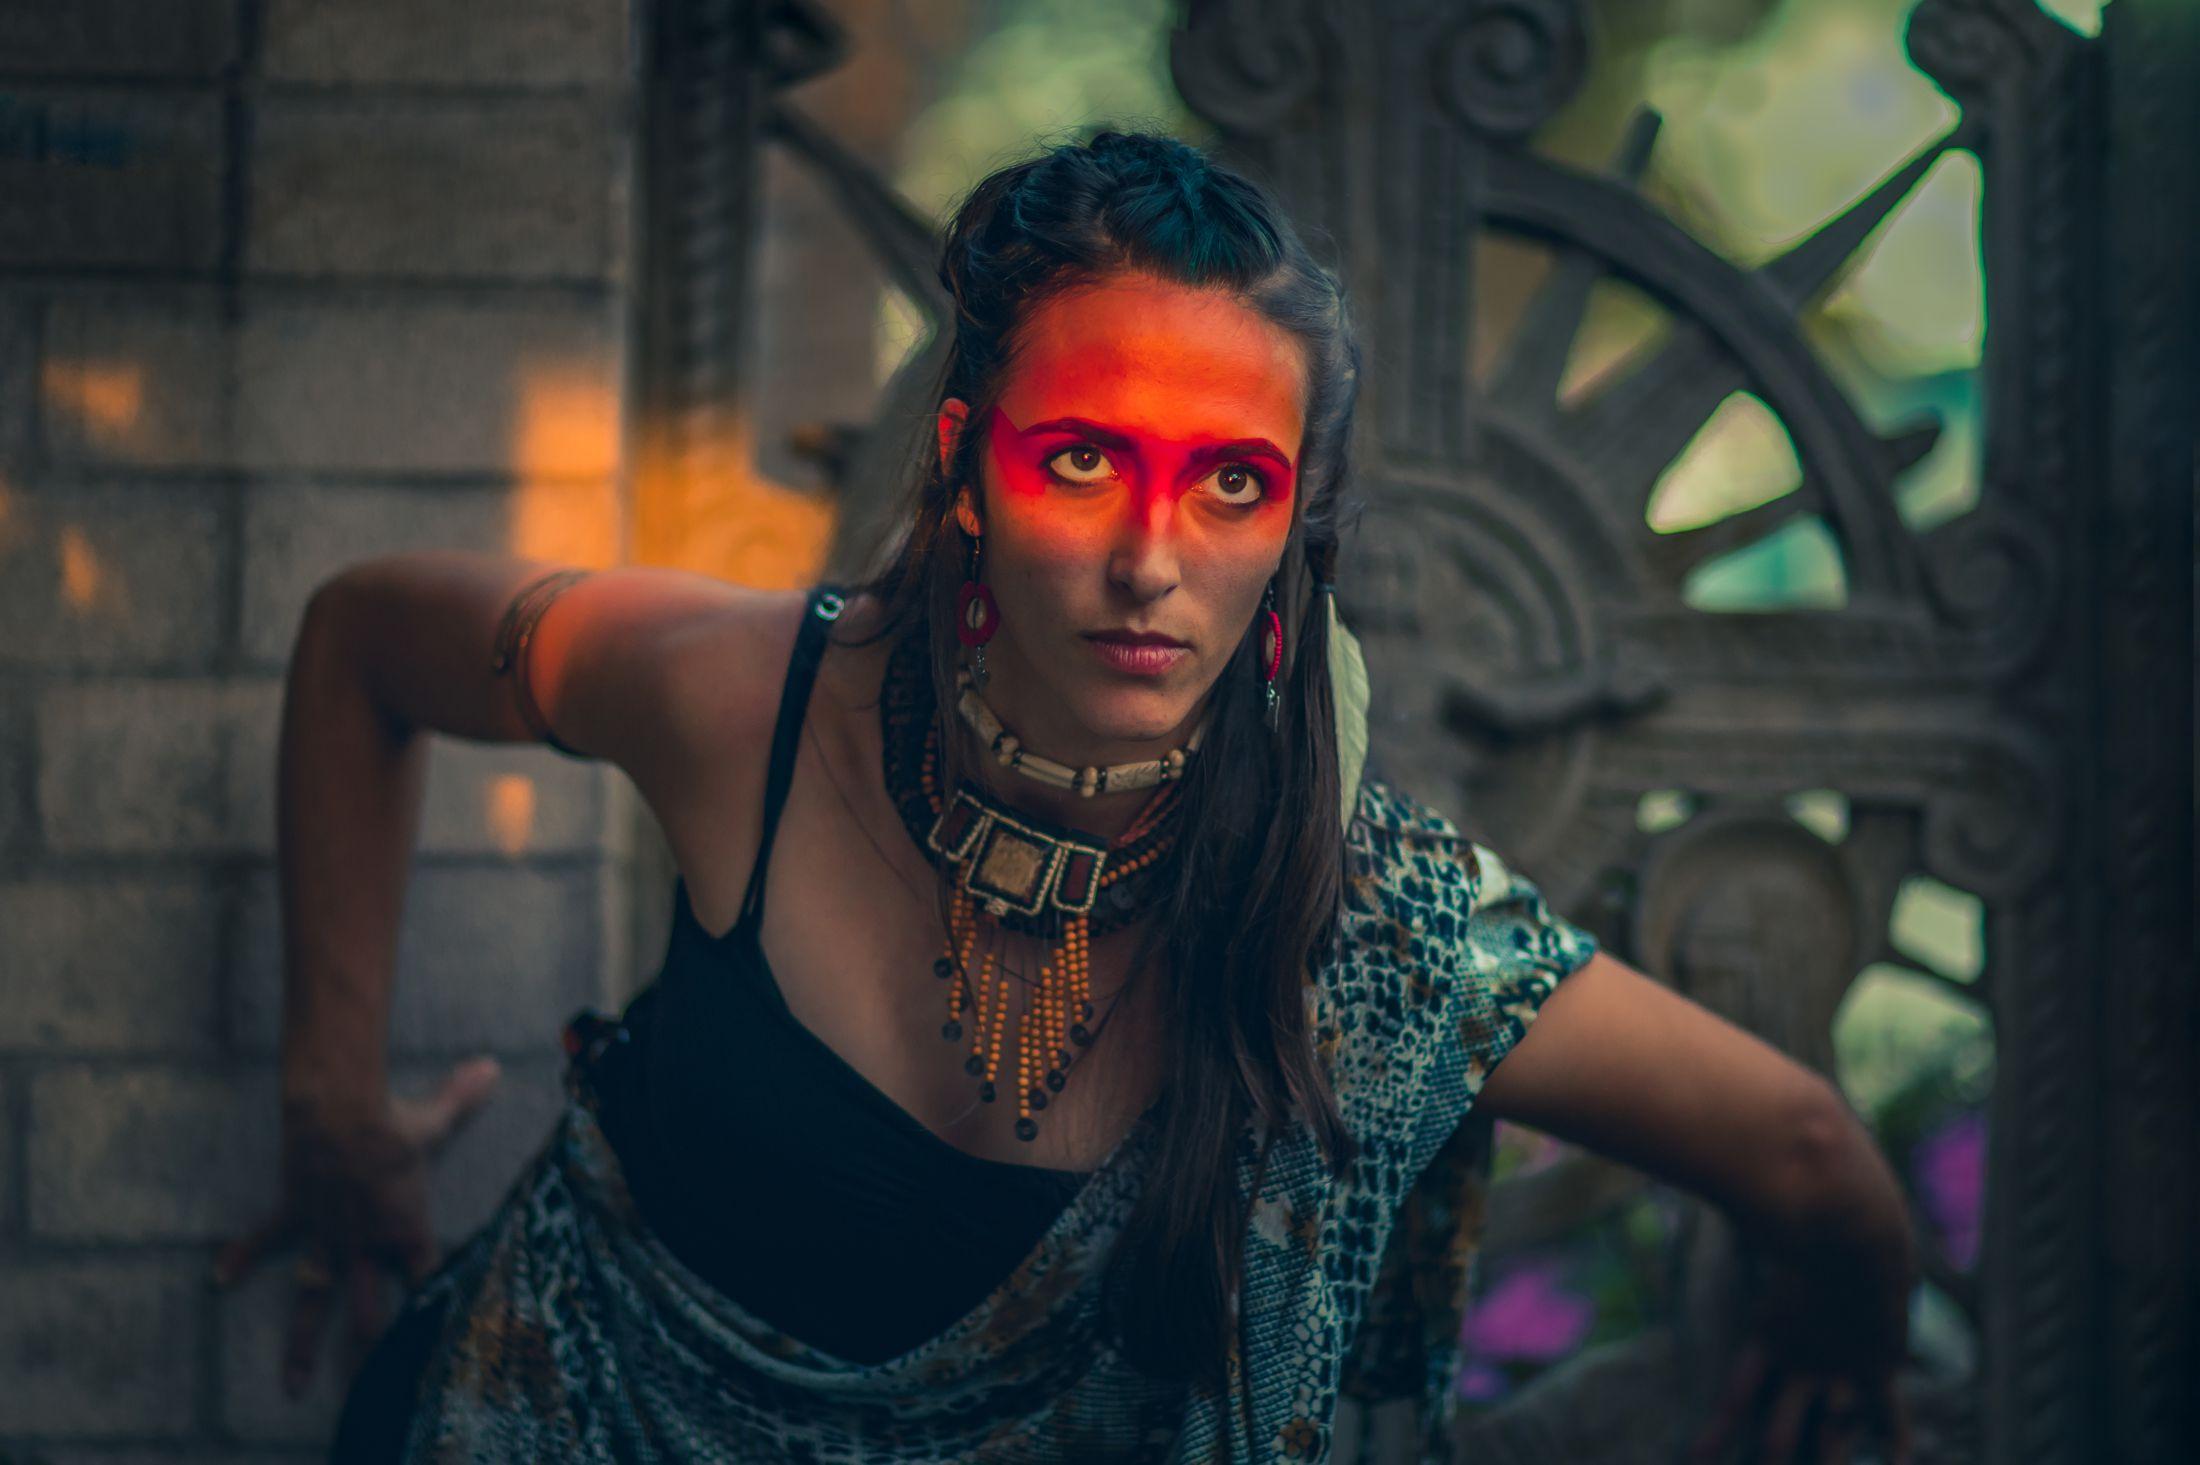 Electric Forest yoga LED light nomad festival style ethnic global fashion shoot warpaint tribal 2.jpg